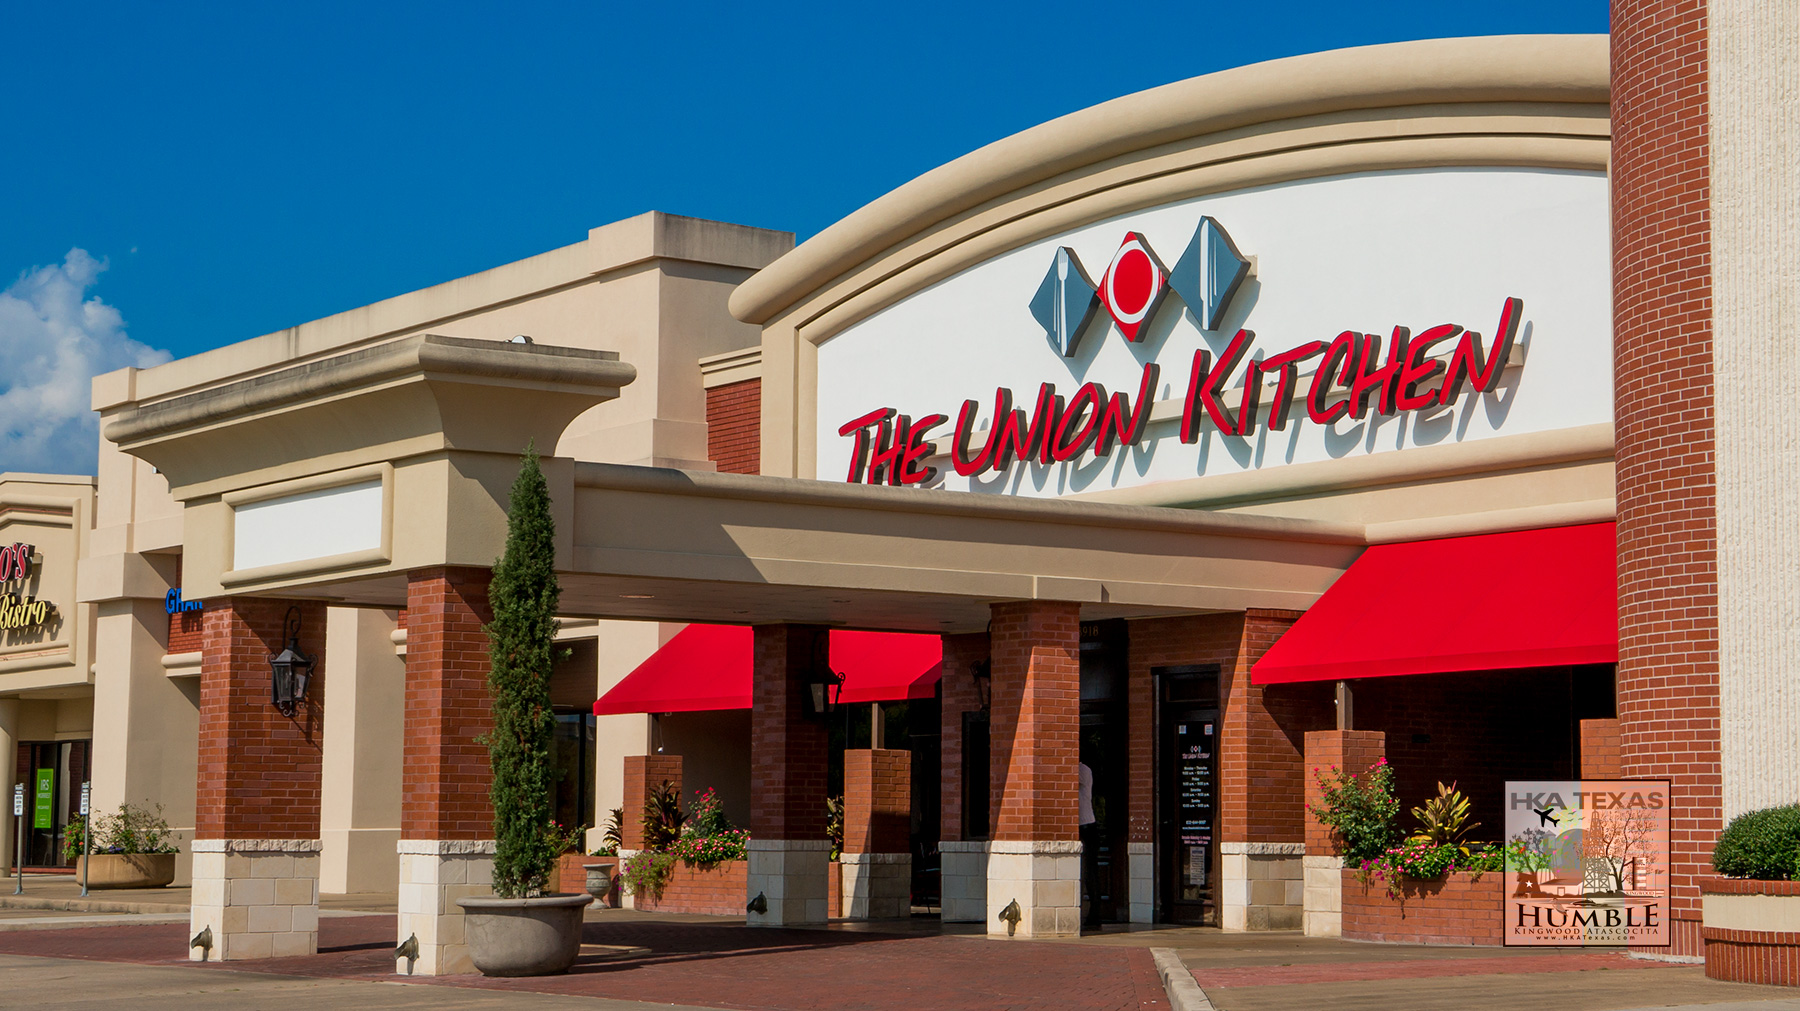 The Union Kitchen Kingwood Texas Restaurant